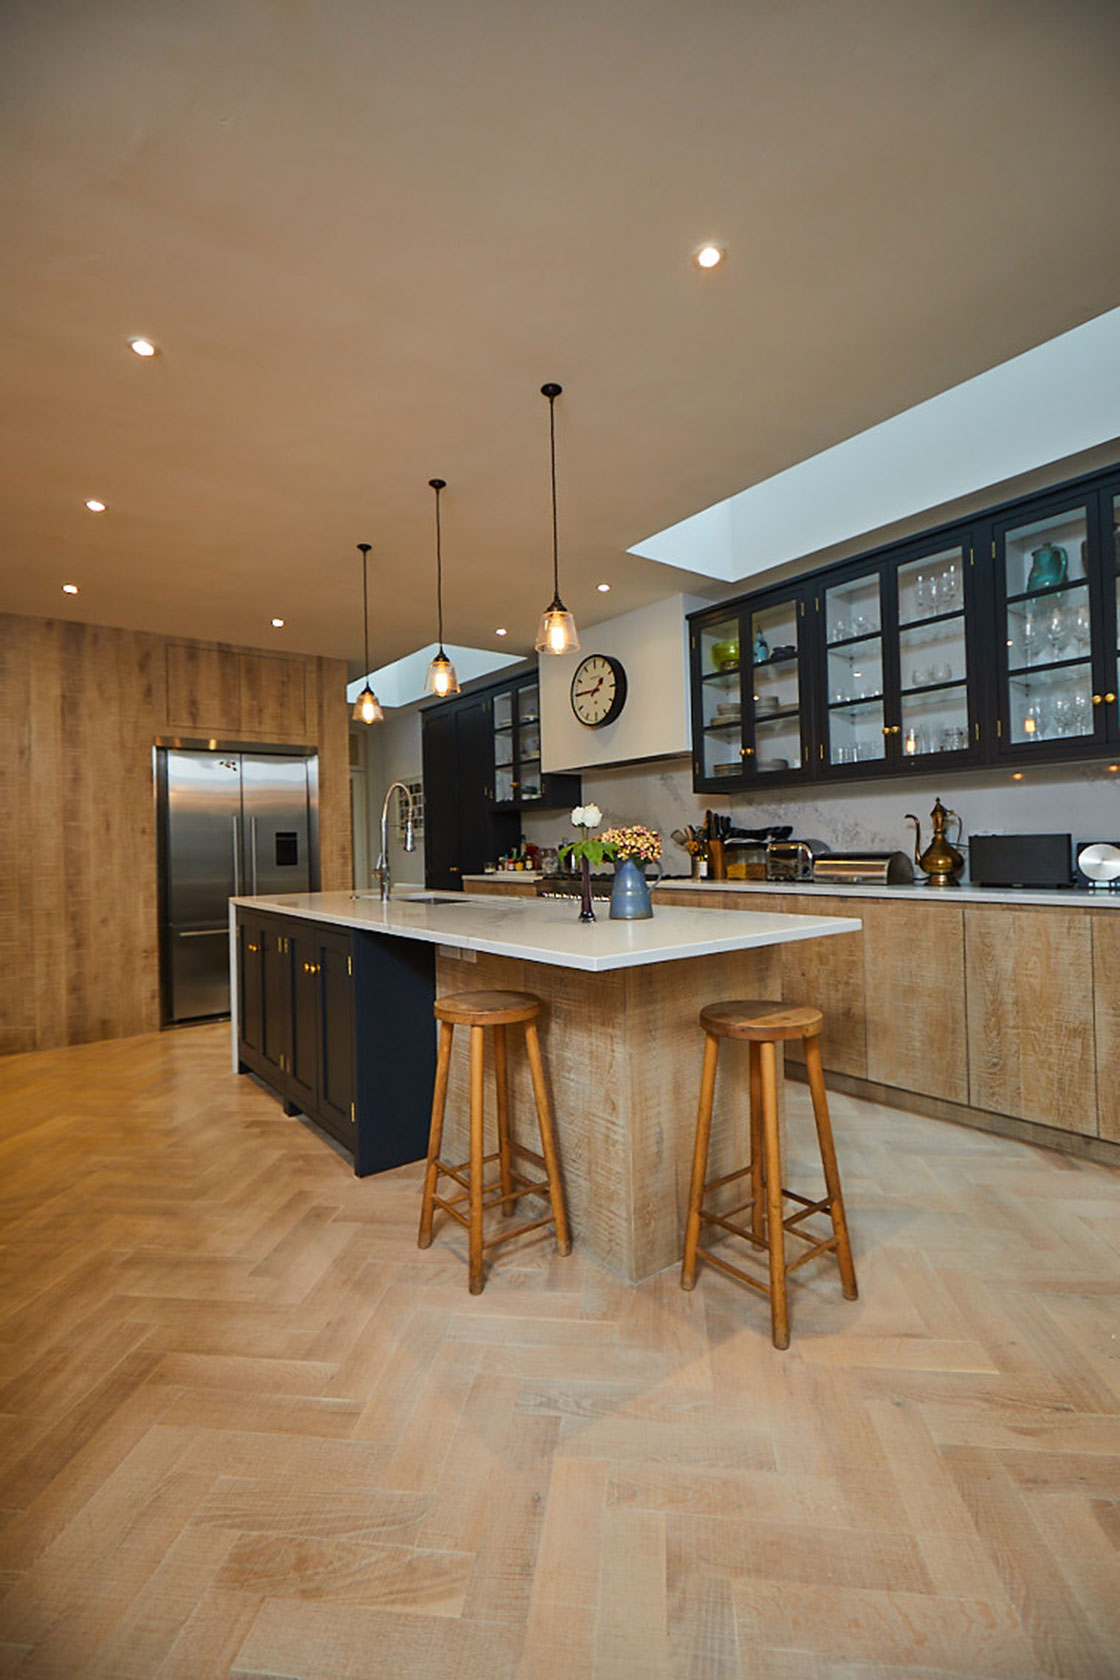 Solid oak barstools sit under kitchen island